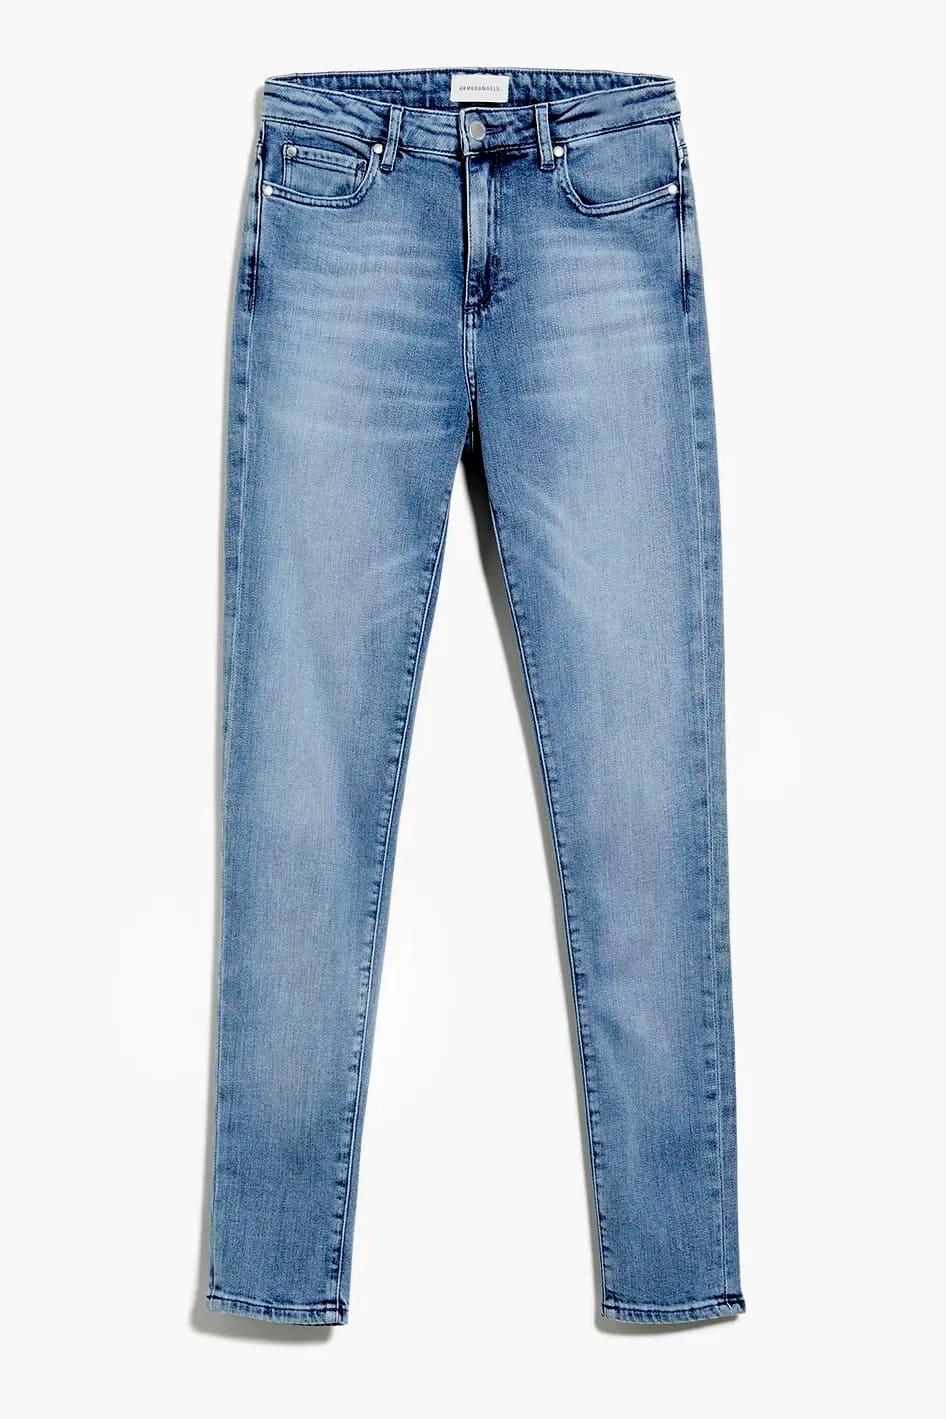 roberta organic fashion Armedangels Jeans Tillaa Stretch sky blue 2